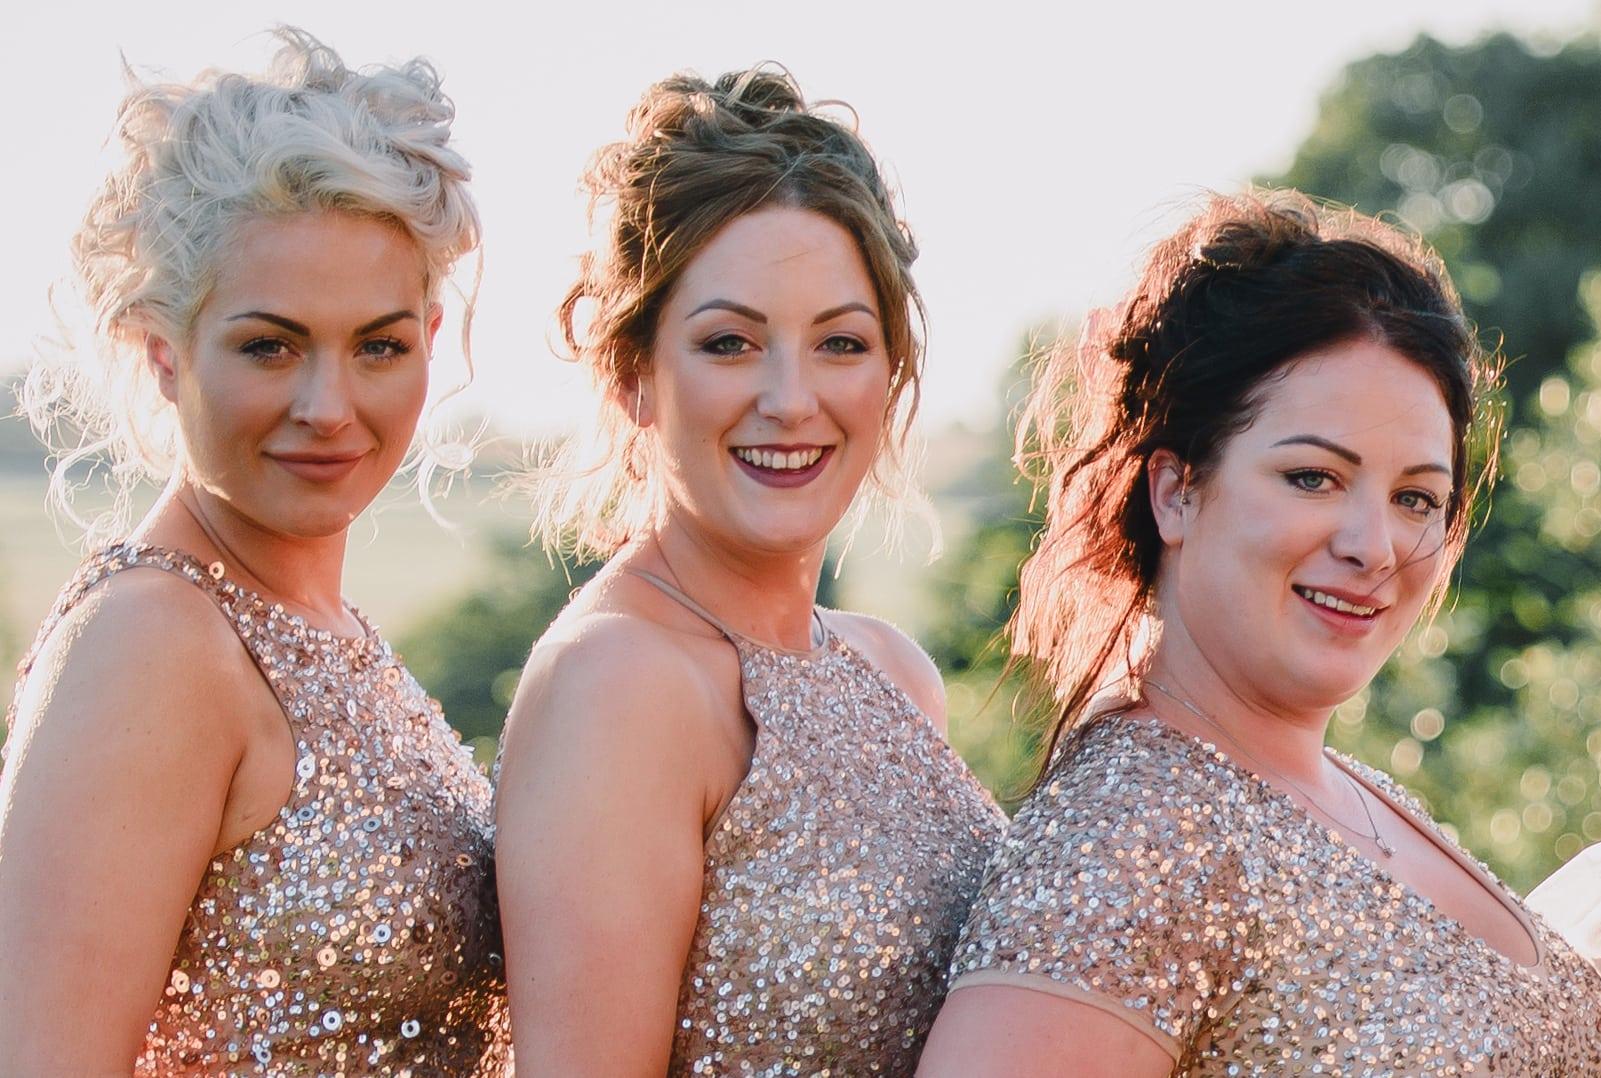 dodford-manor-summer-wedding-scarisbrick-miller-745-100-percent